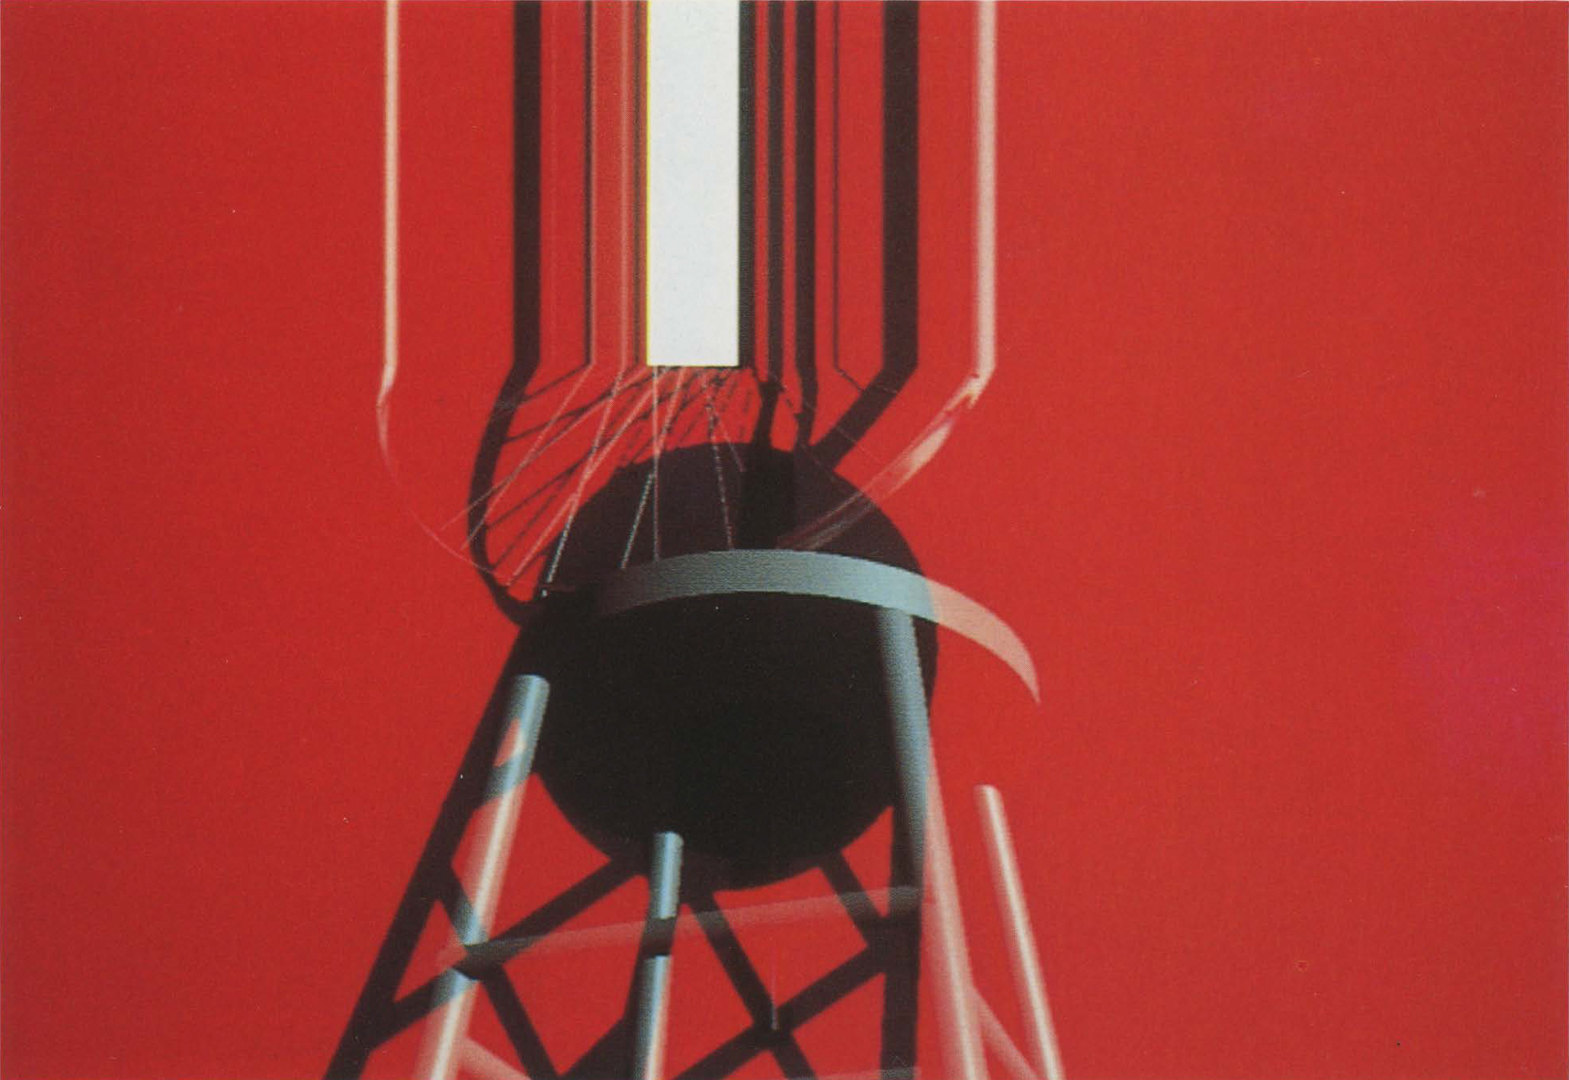 ©1989, Uri Dothan, Abstract Matters